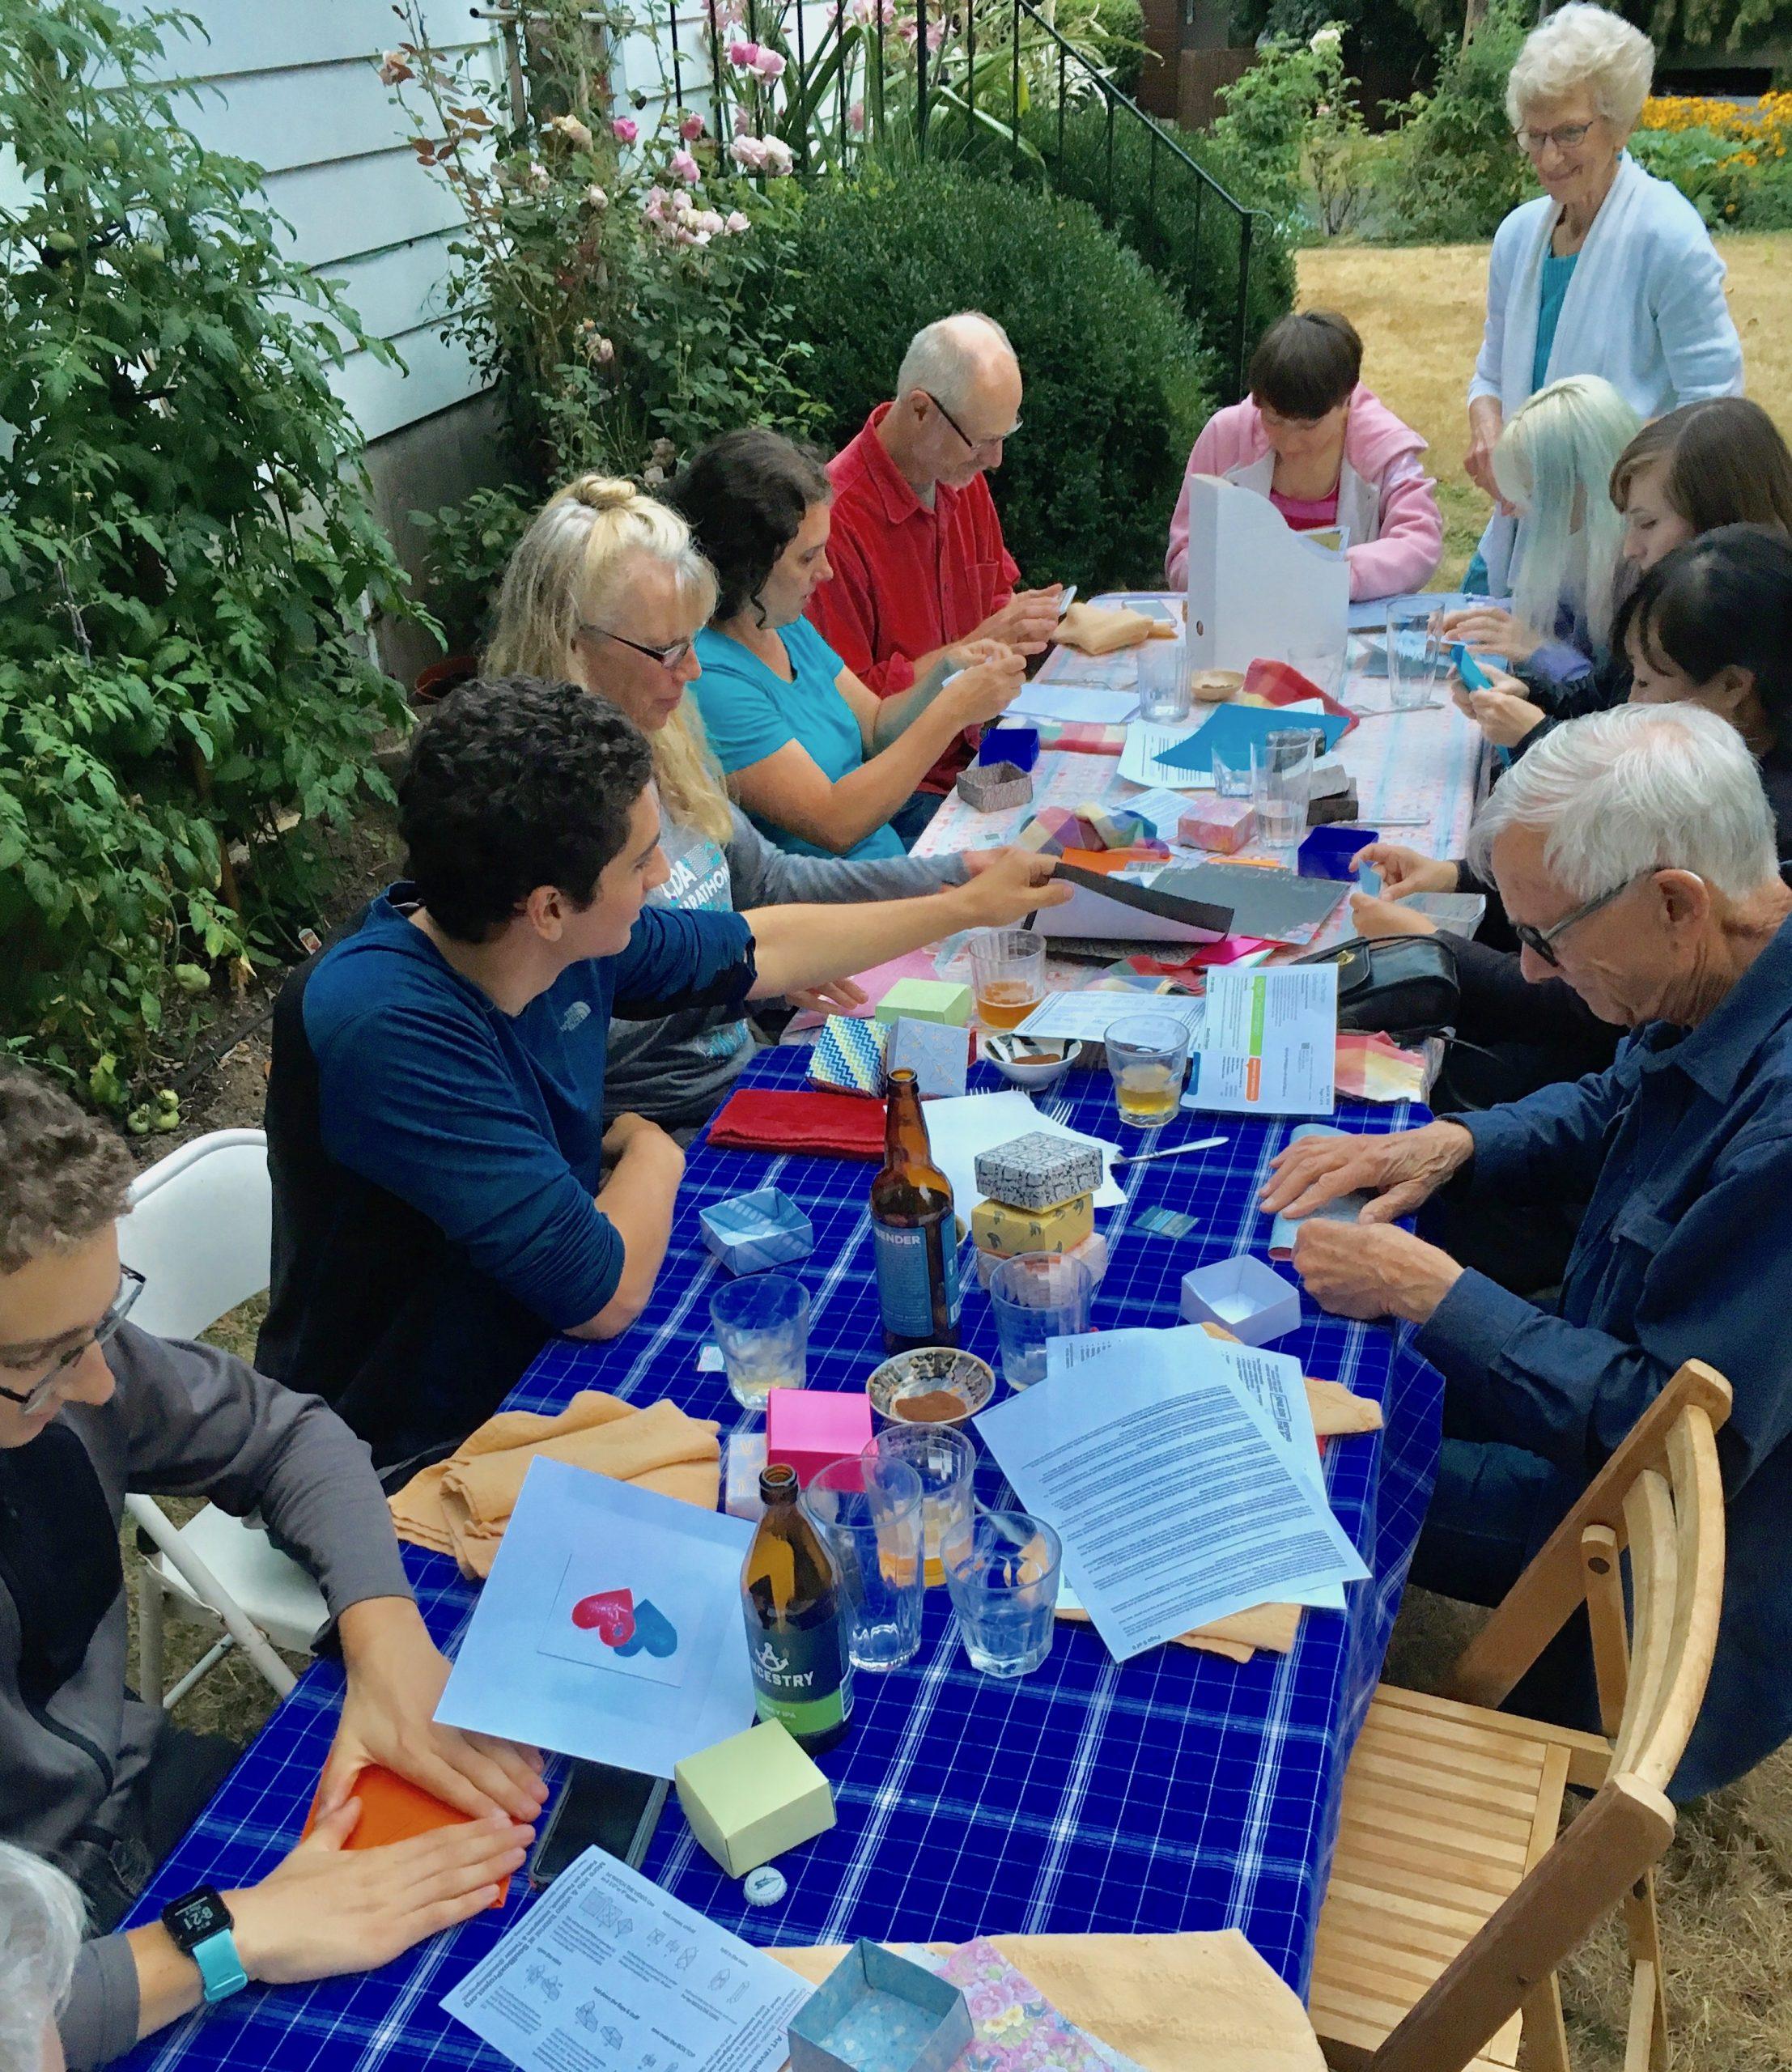 Folding together: Backyard gathering